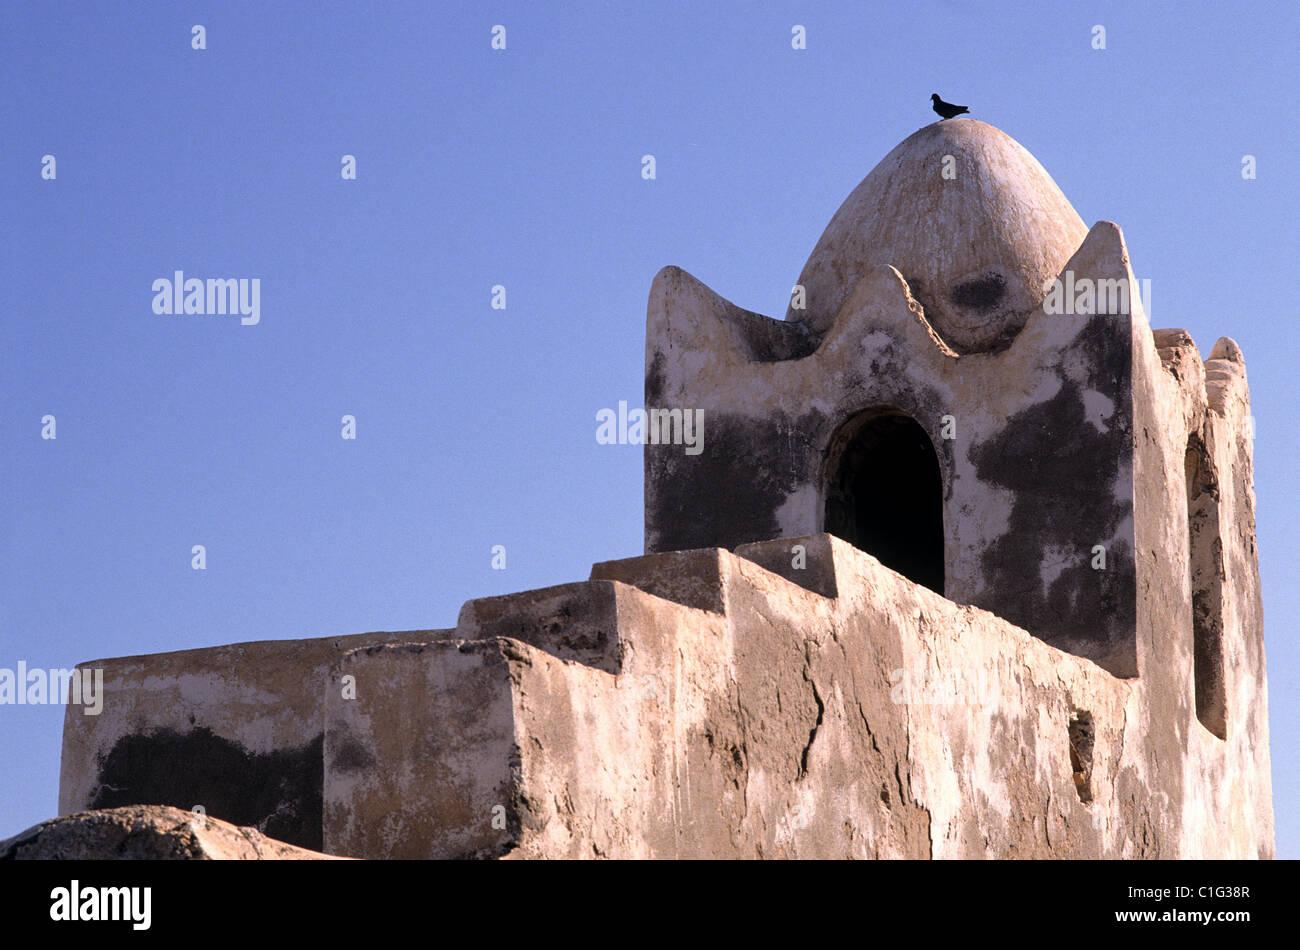 Republic of Djibouti, Tadjoura, the mosque - Stock Image